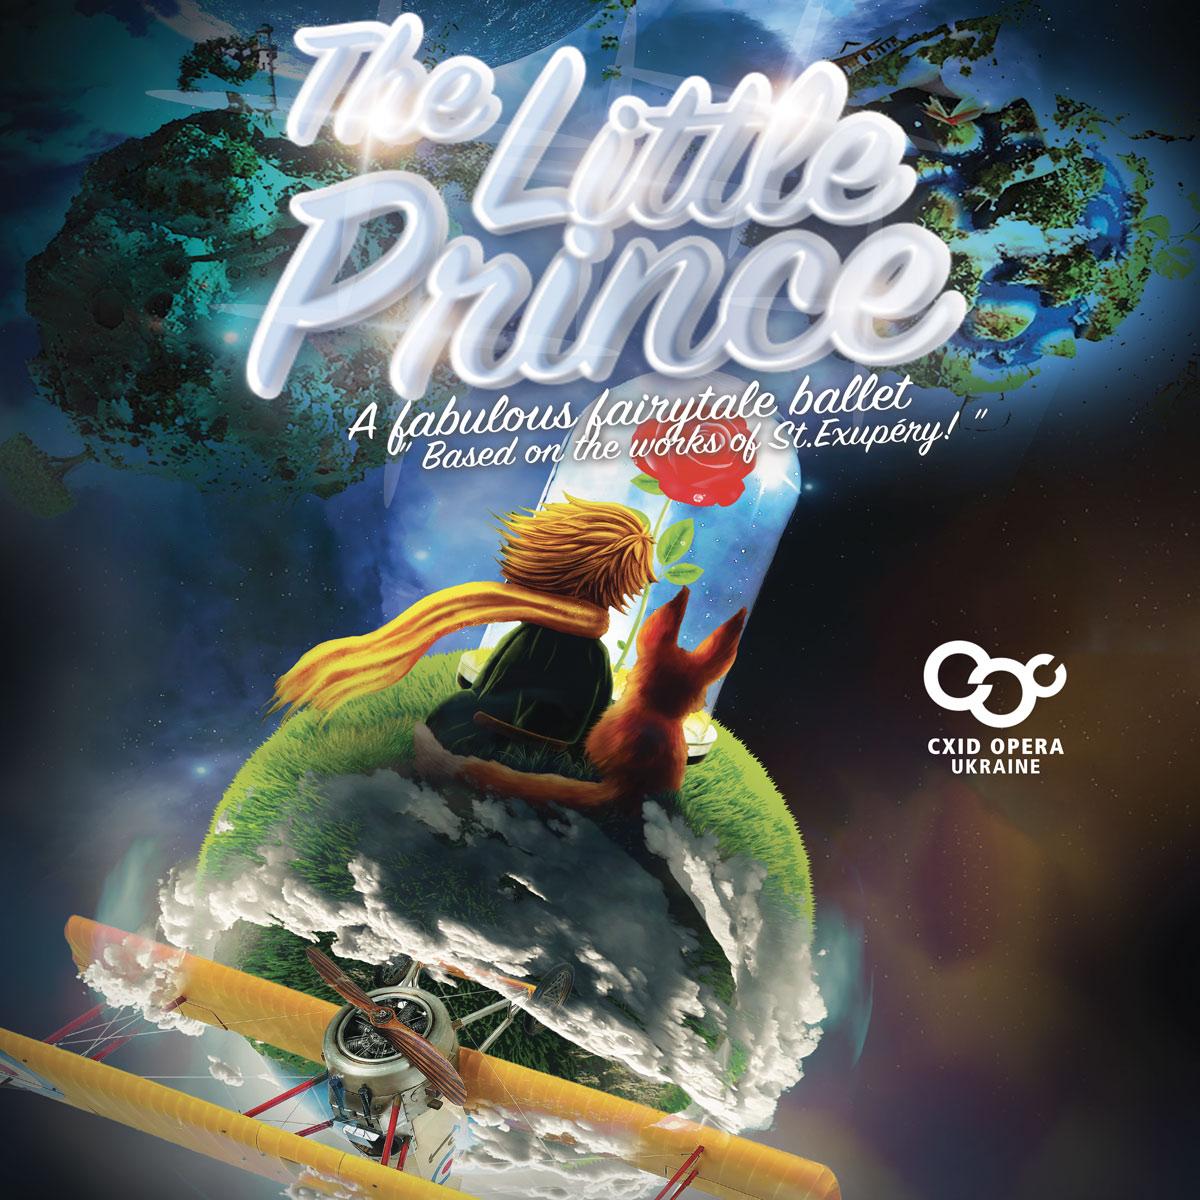 The Little Prince, a fabulous fairytale ballet